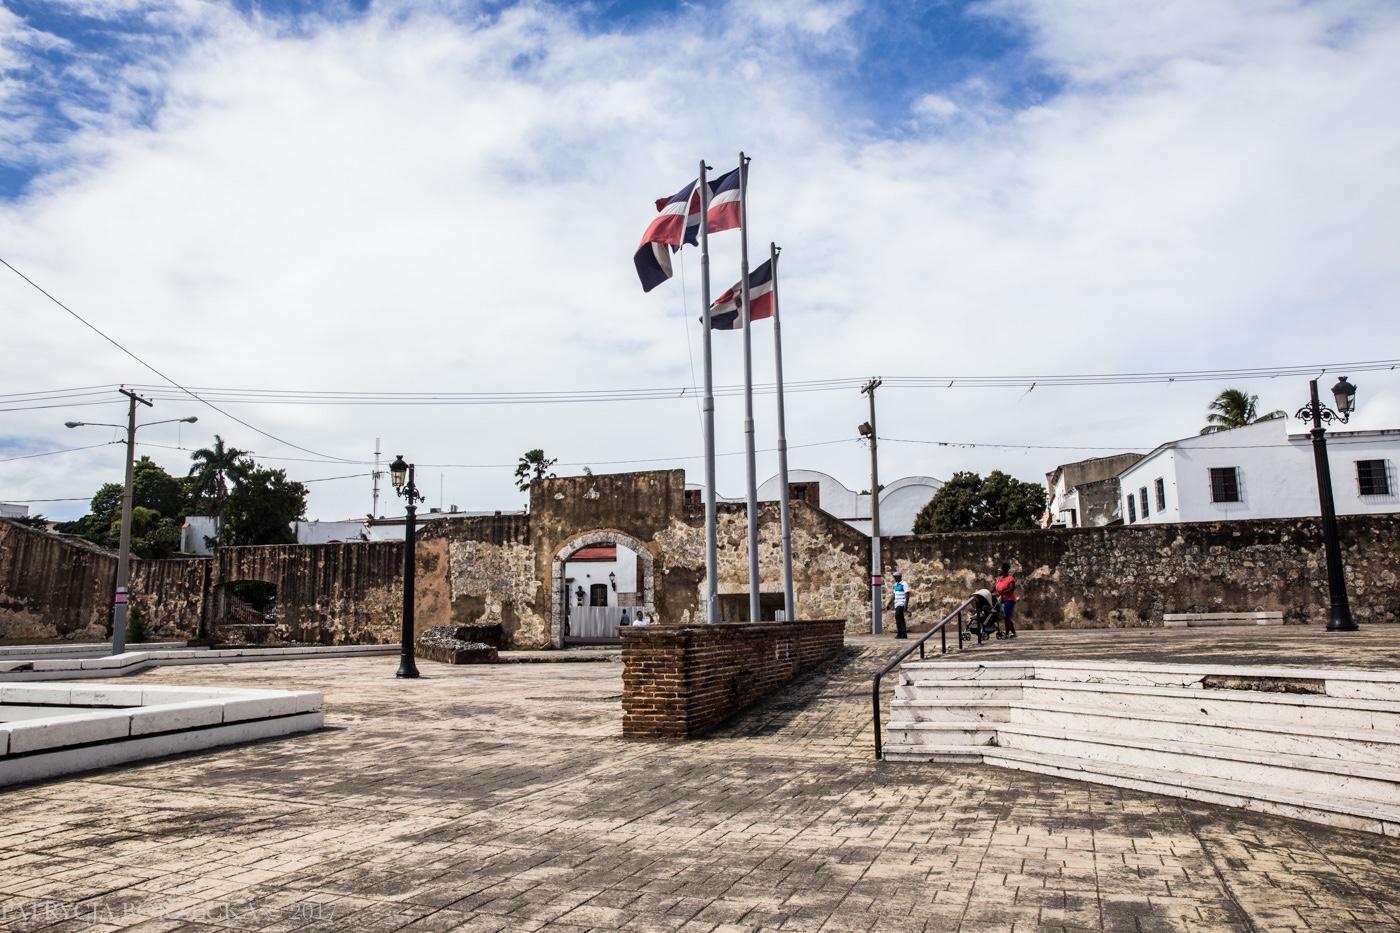 Patrycja-Borzecka-Photo-Santo-Domingo-Zona-Colonial-01